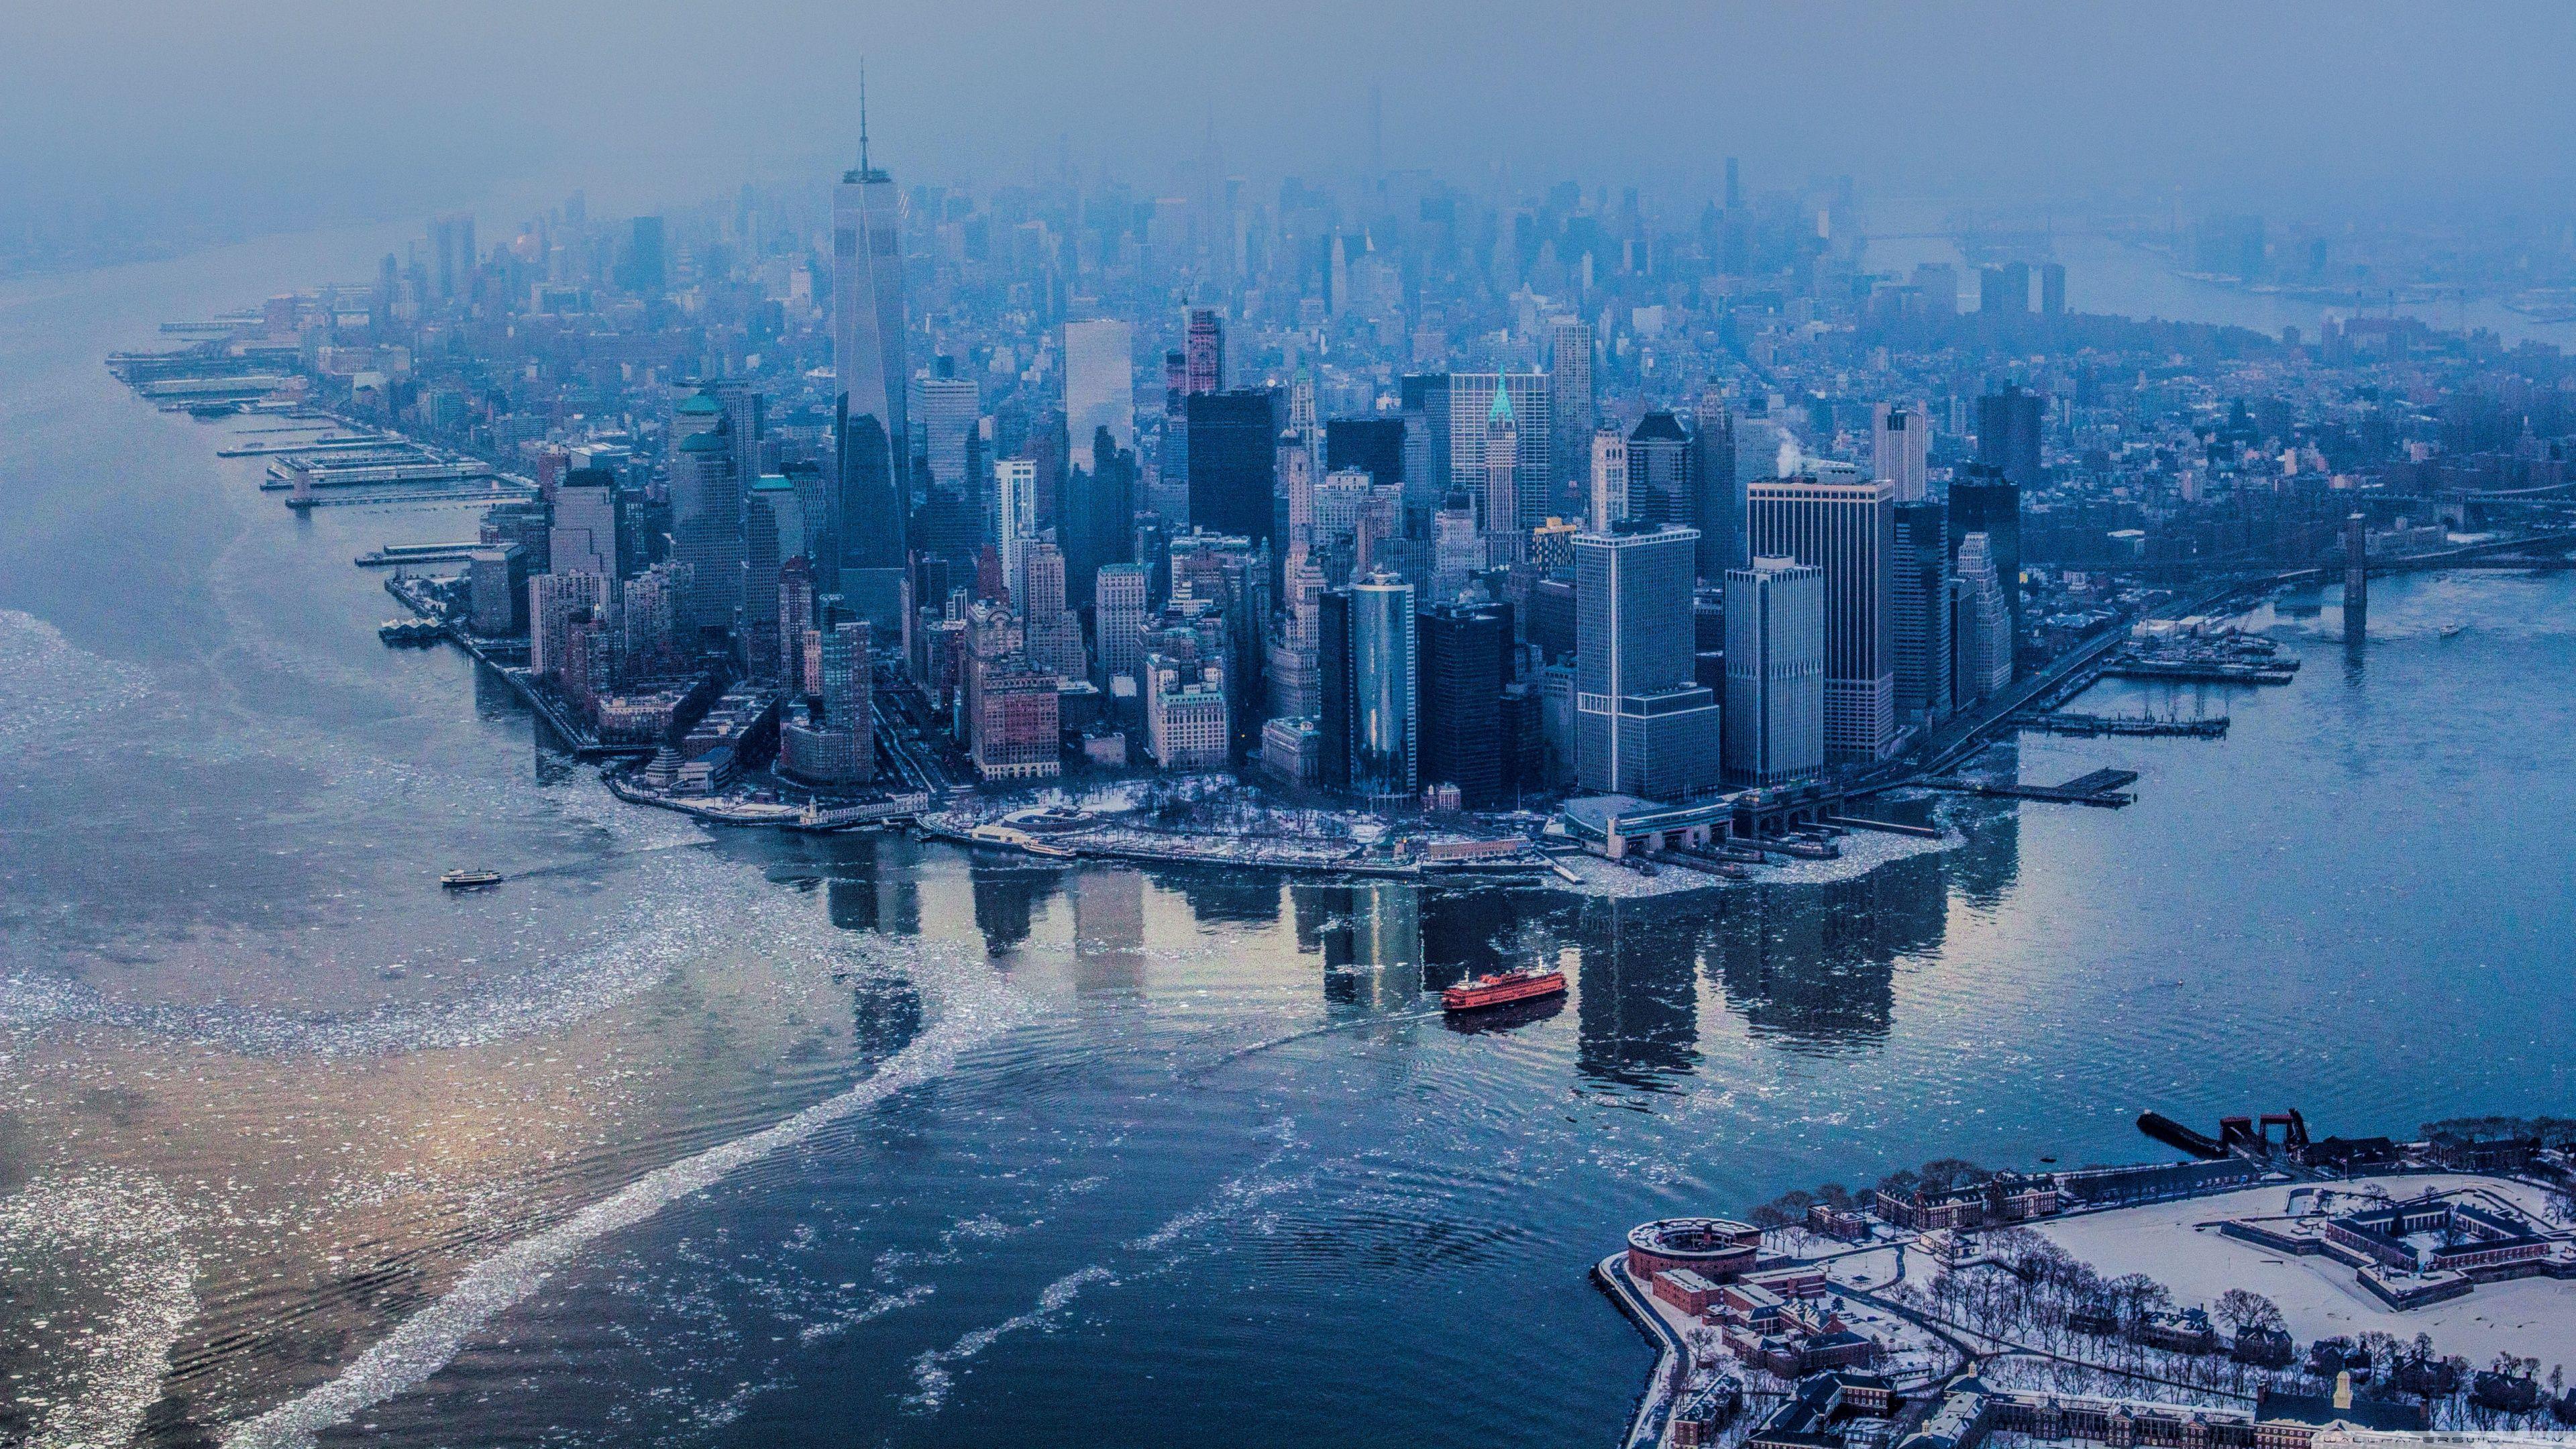 New York City Aerial View 3840 X 2160 New York Wallpaper New York City Images Manhattan New York